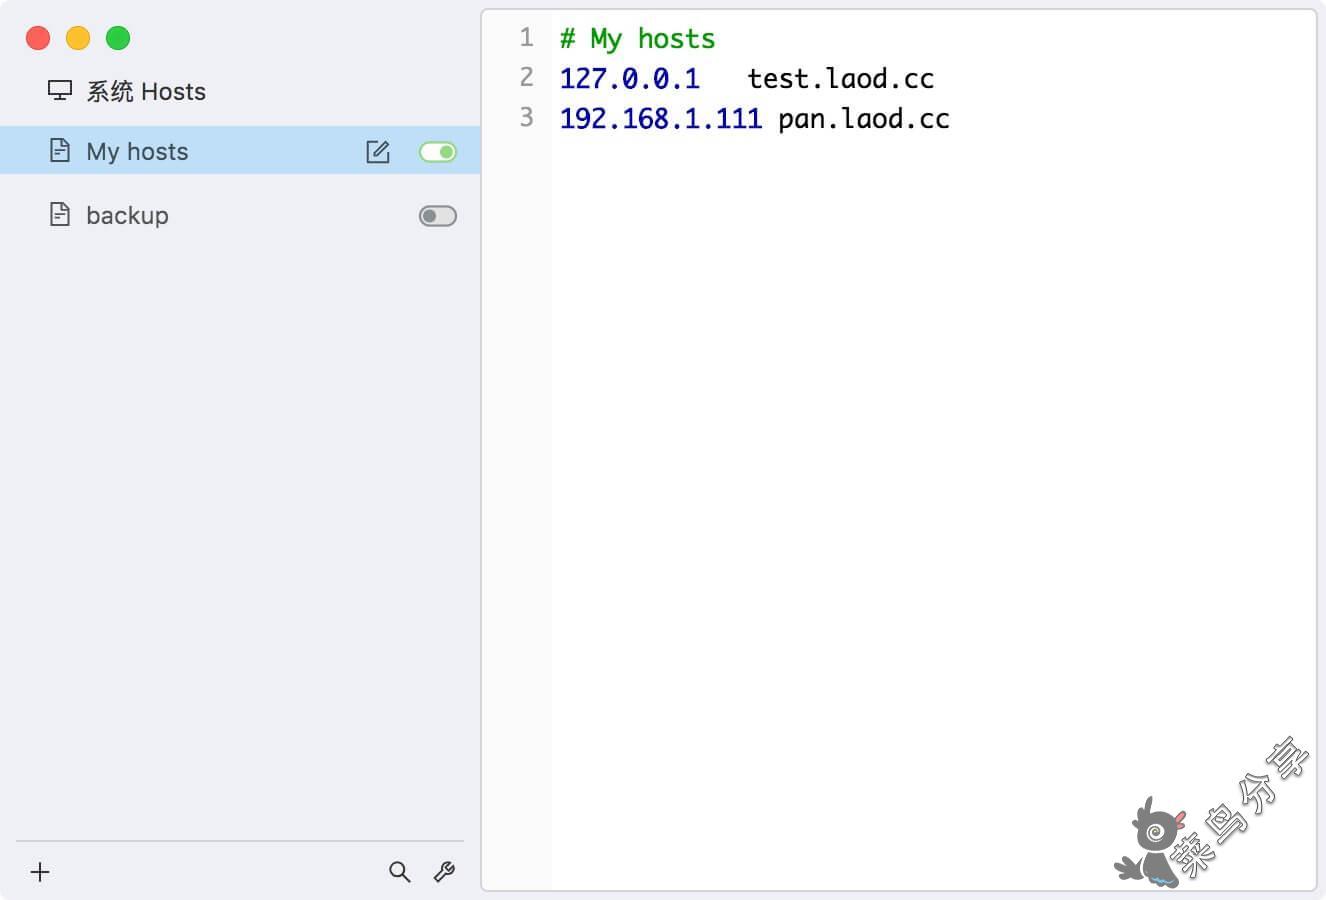 SwitchHosts 一个修改、管理、切换多个 hosts 方案的开源工具第1张-菜鸟分享